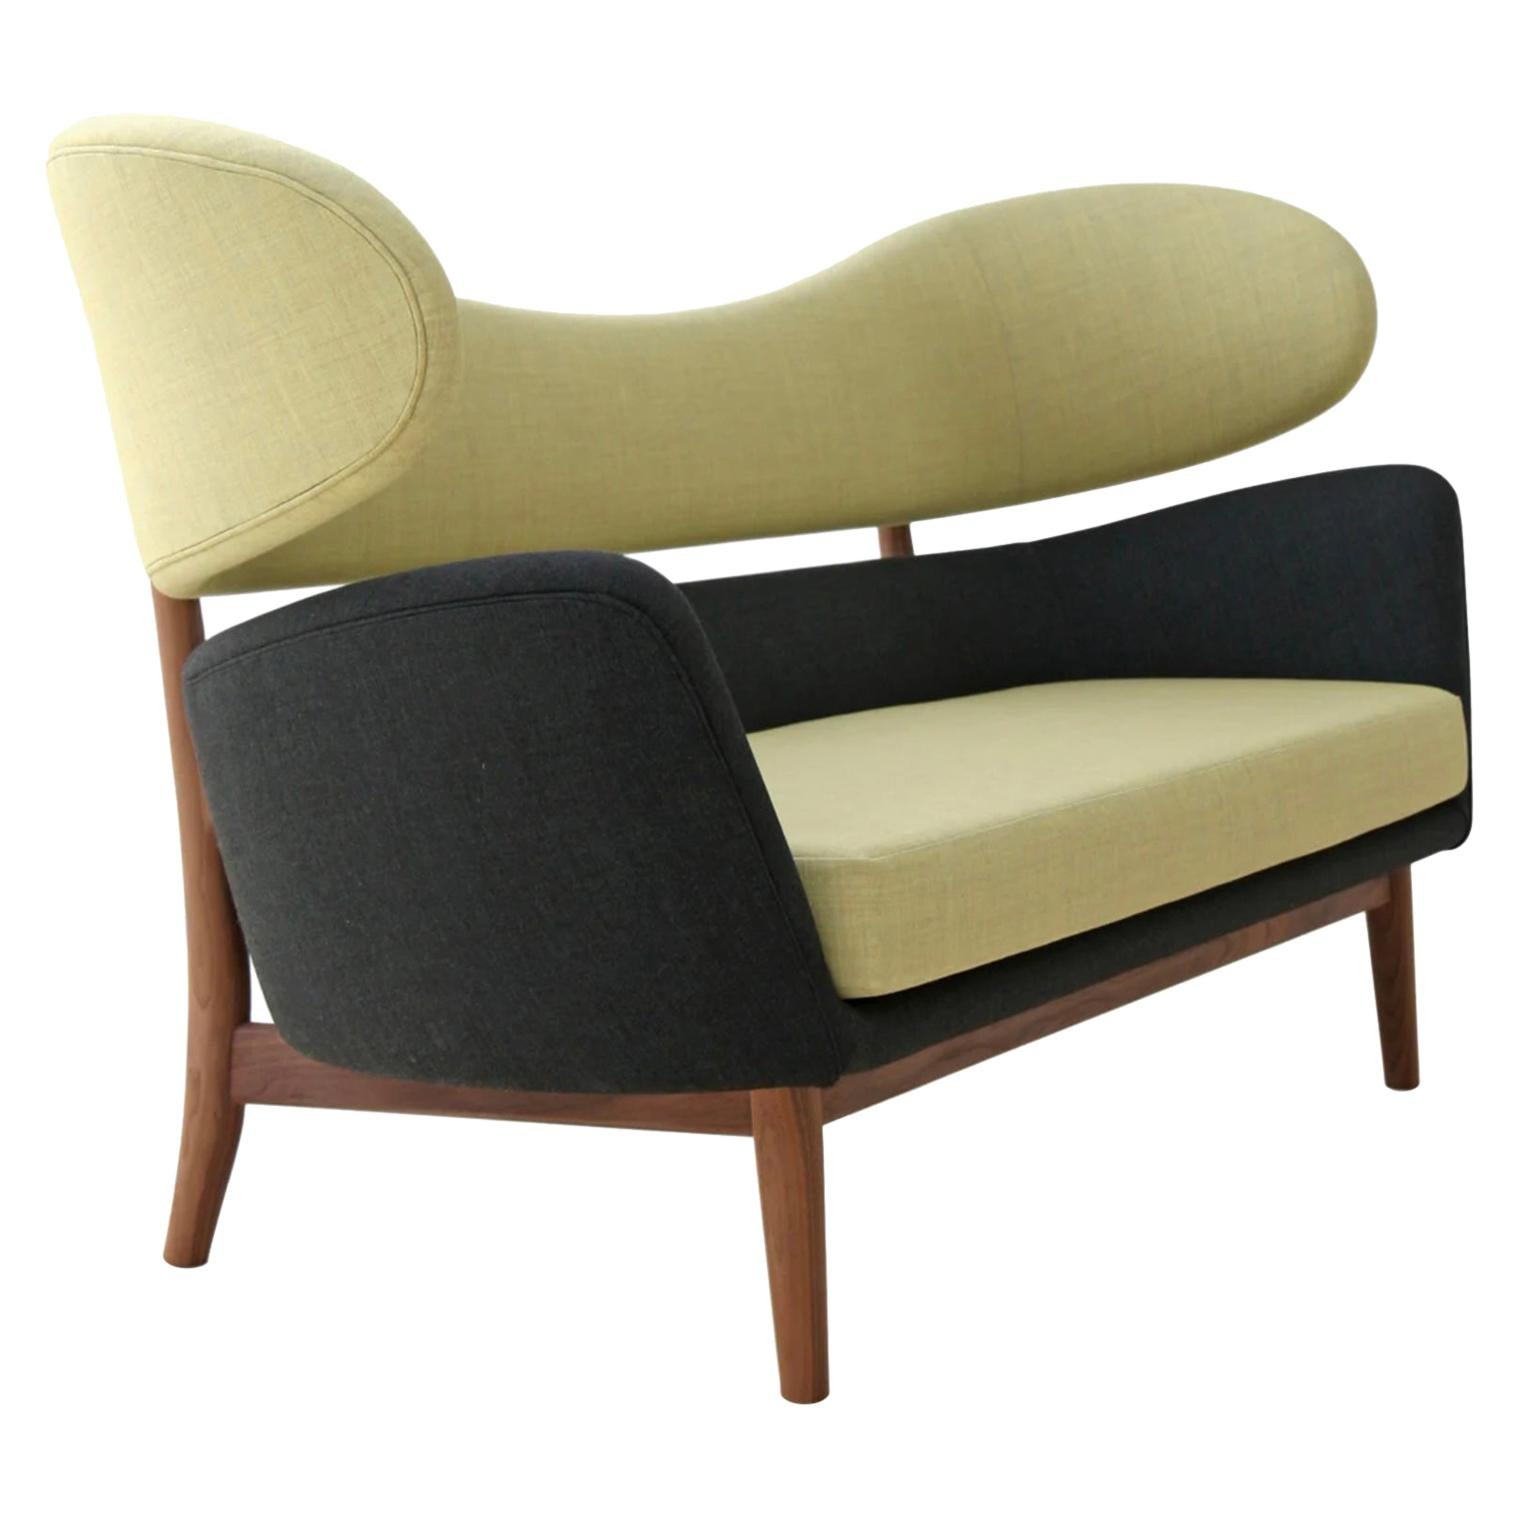 Finn Juhl Baker Sofa 1951, Citron Yellow Kvadret Maharam, Walnut Frame, Denmark